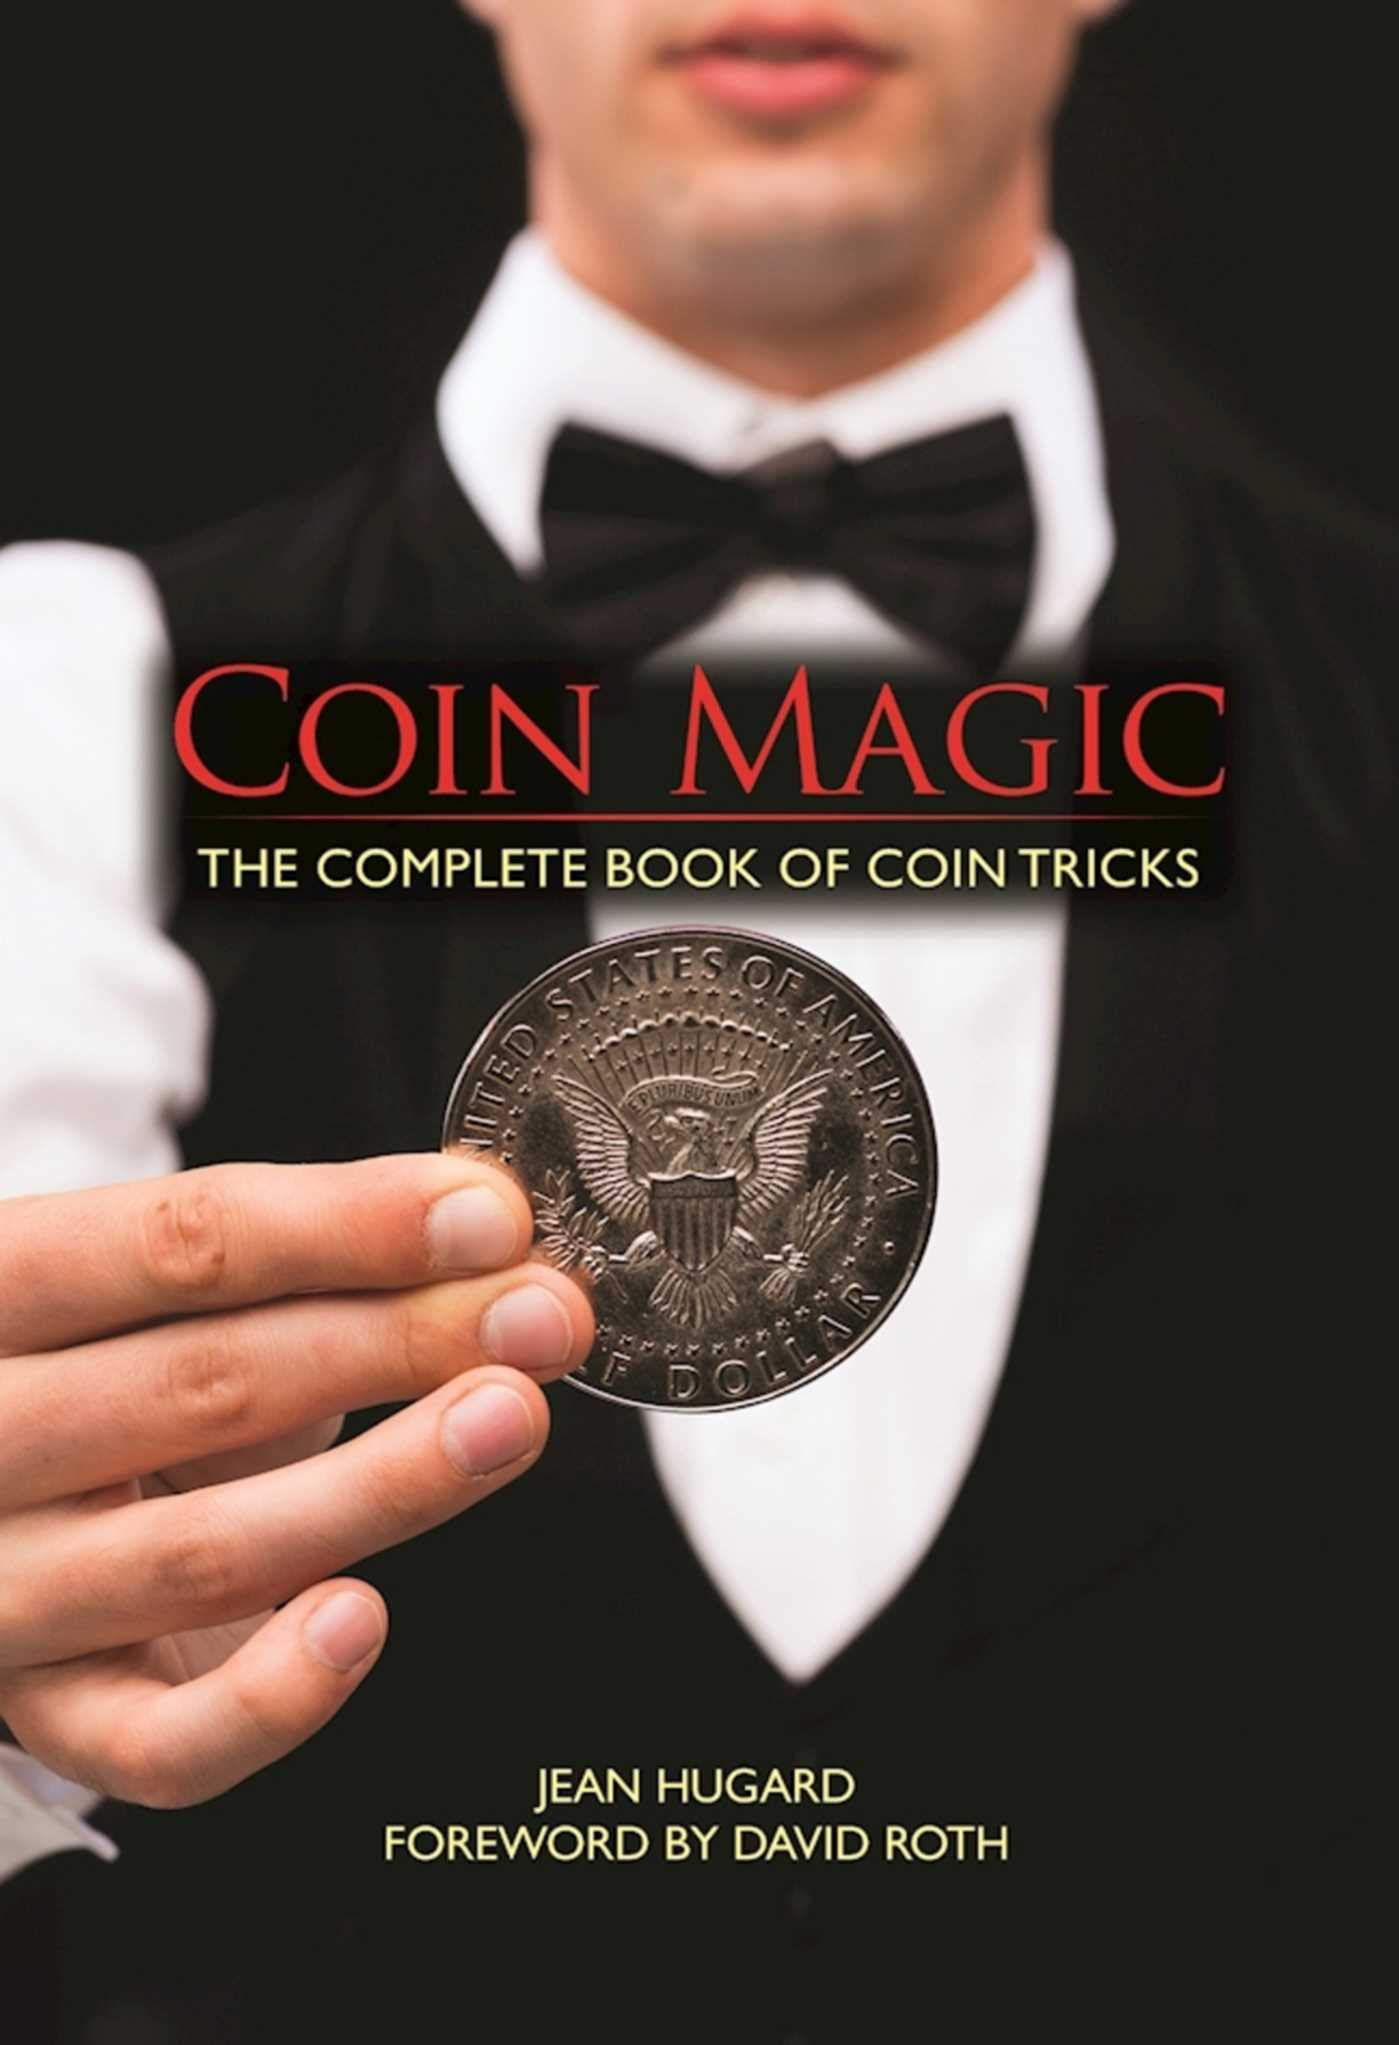 200 Rare Magician Magic Books on USB Card Coin Tricks Learn Illusion Secret 59